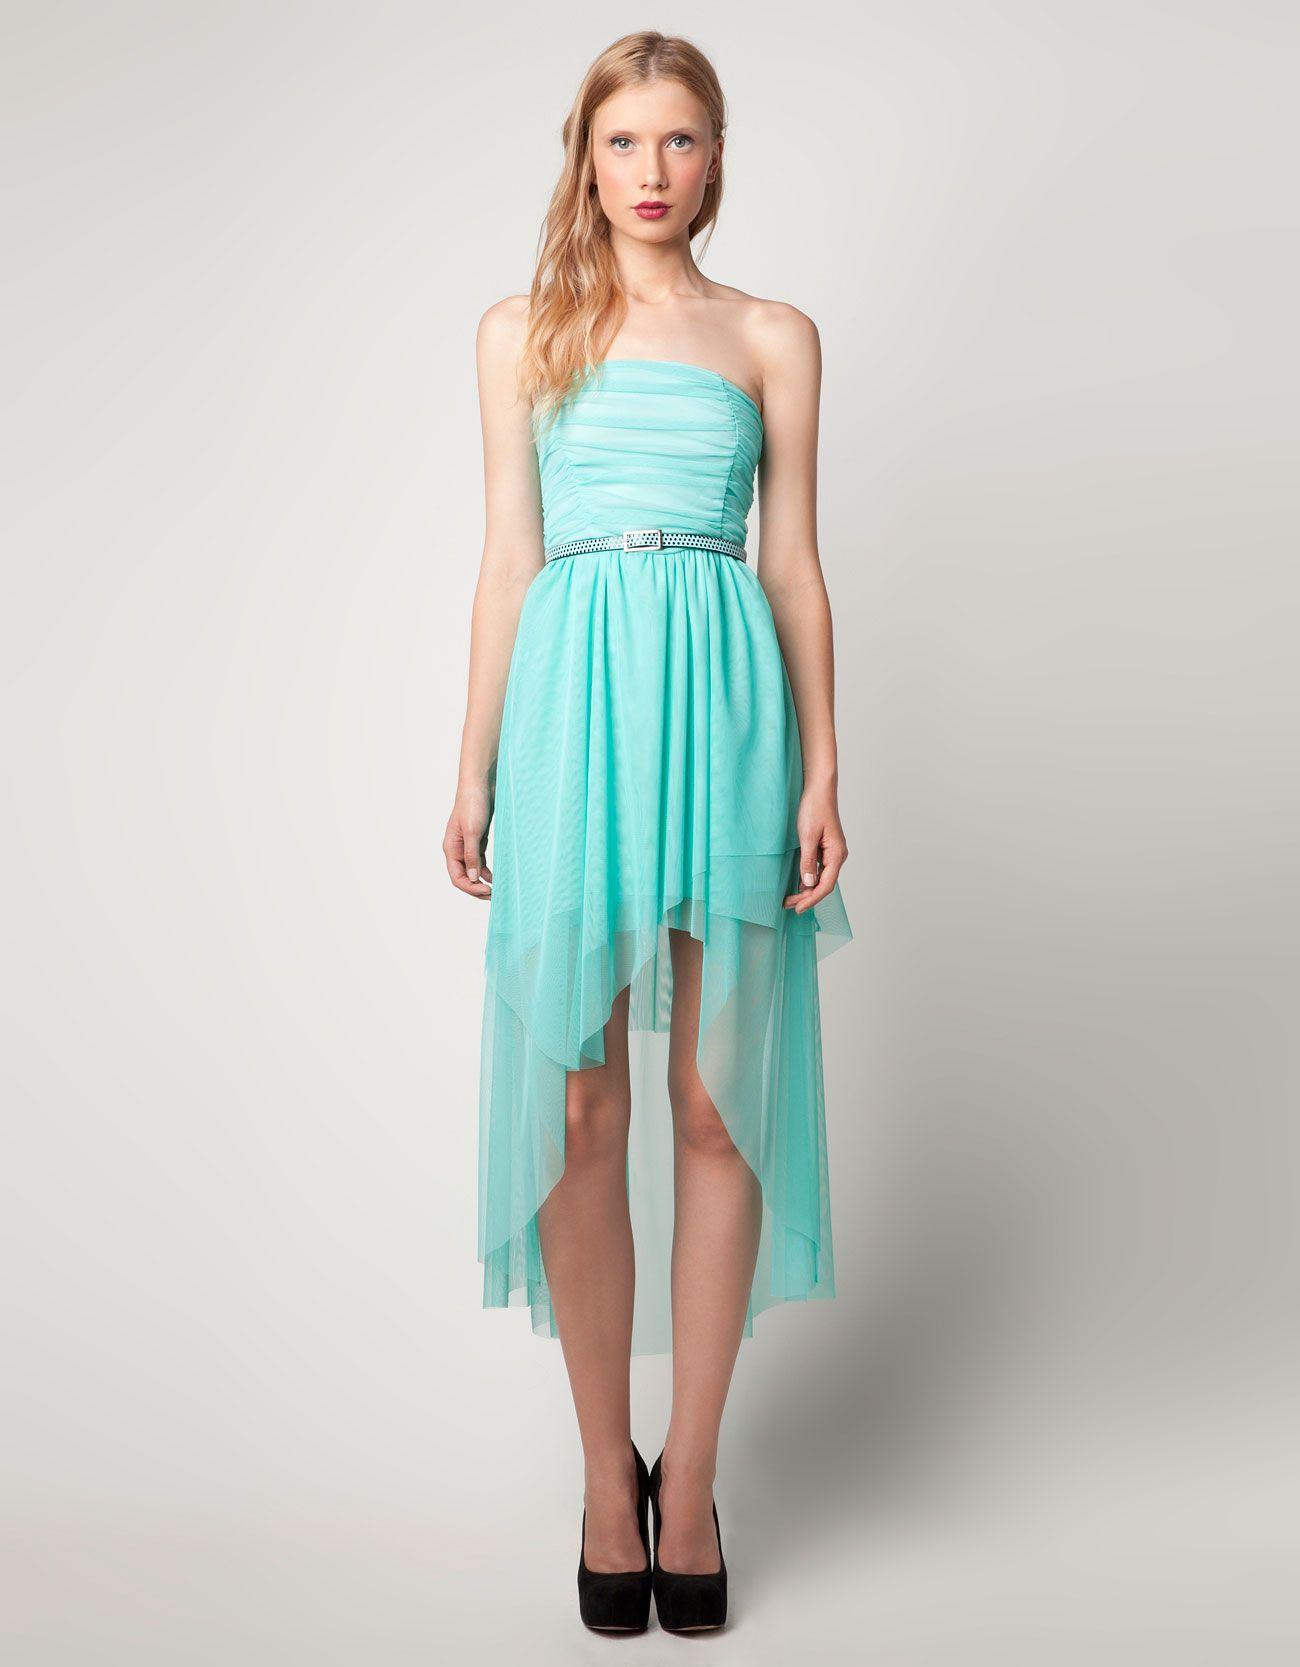 Bershka México - Vestido Bershka tul | My Style | Pinterest ...